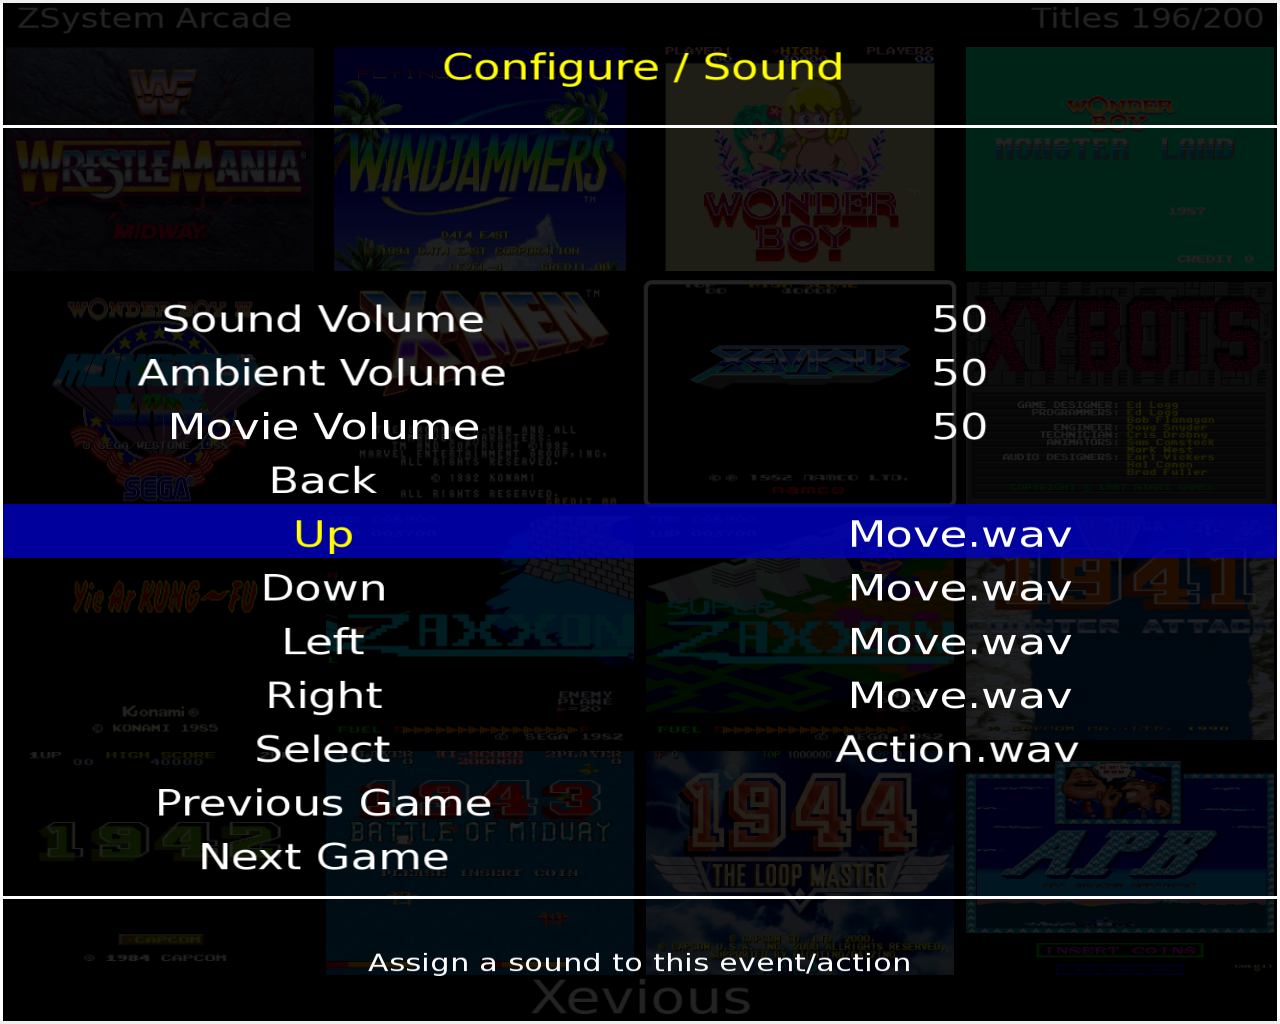 Configure_Sound